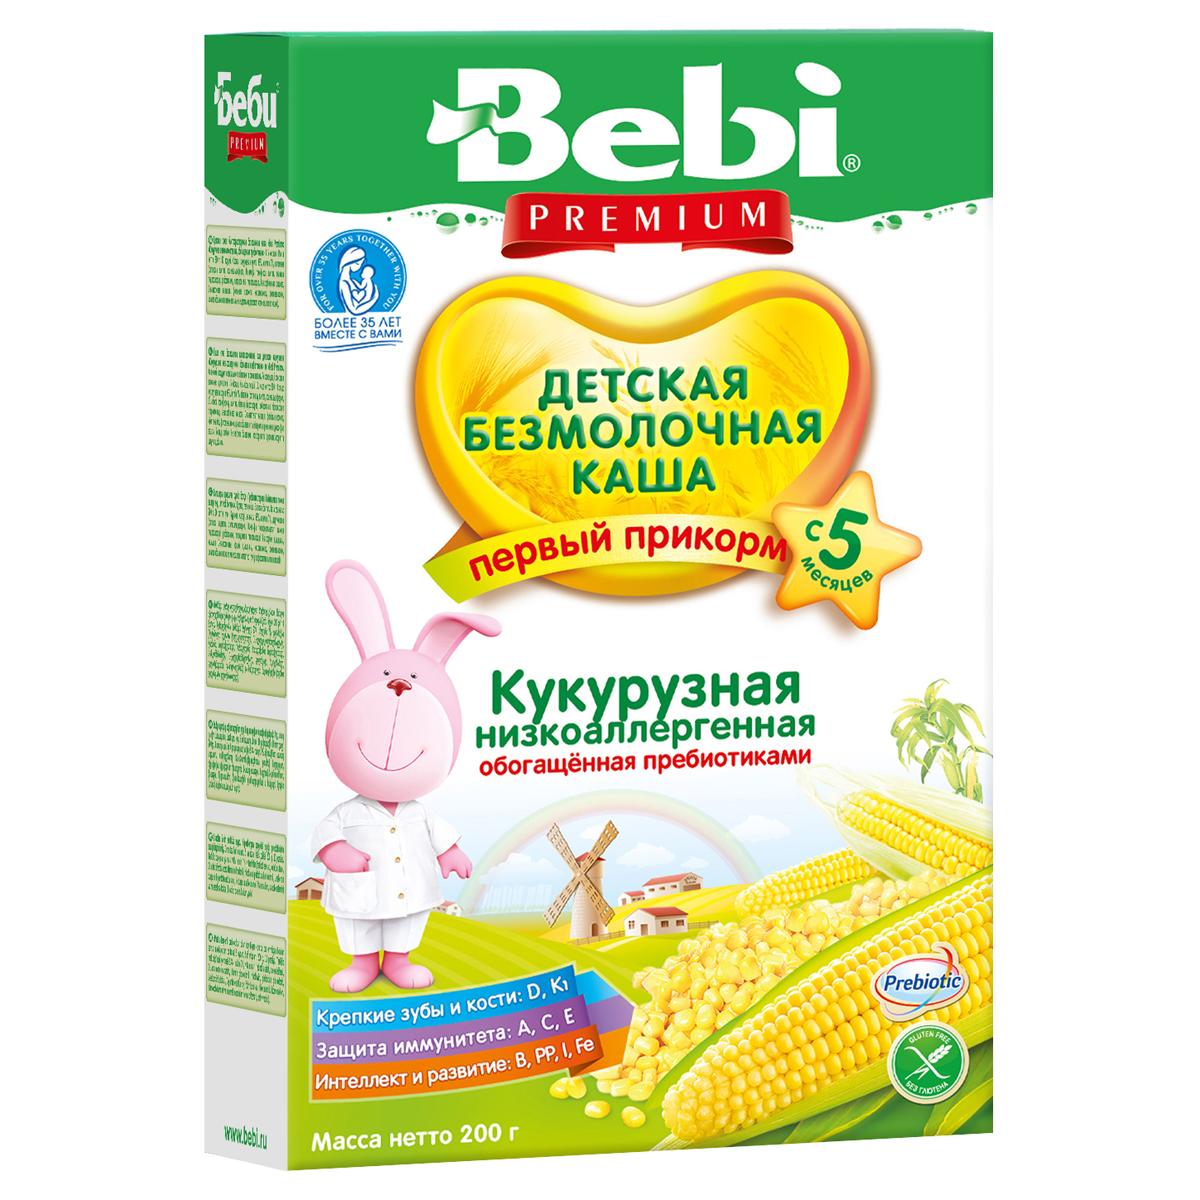 ���� Bebi Premium ����������� 200 �� ���������� ���������������� (� 5 ���)